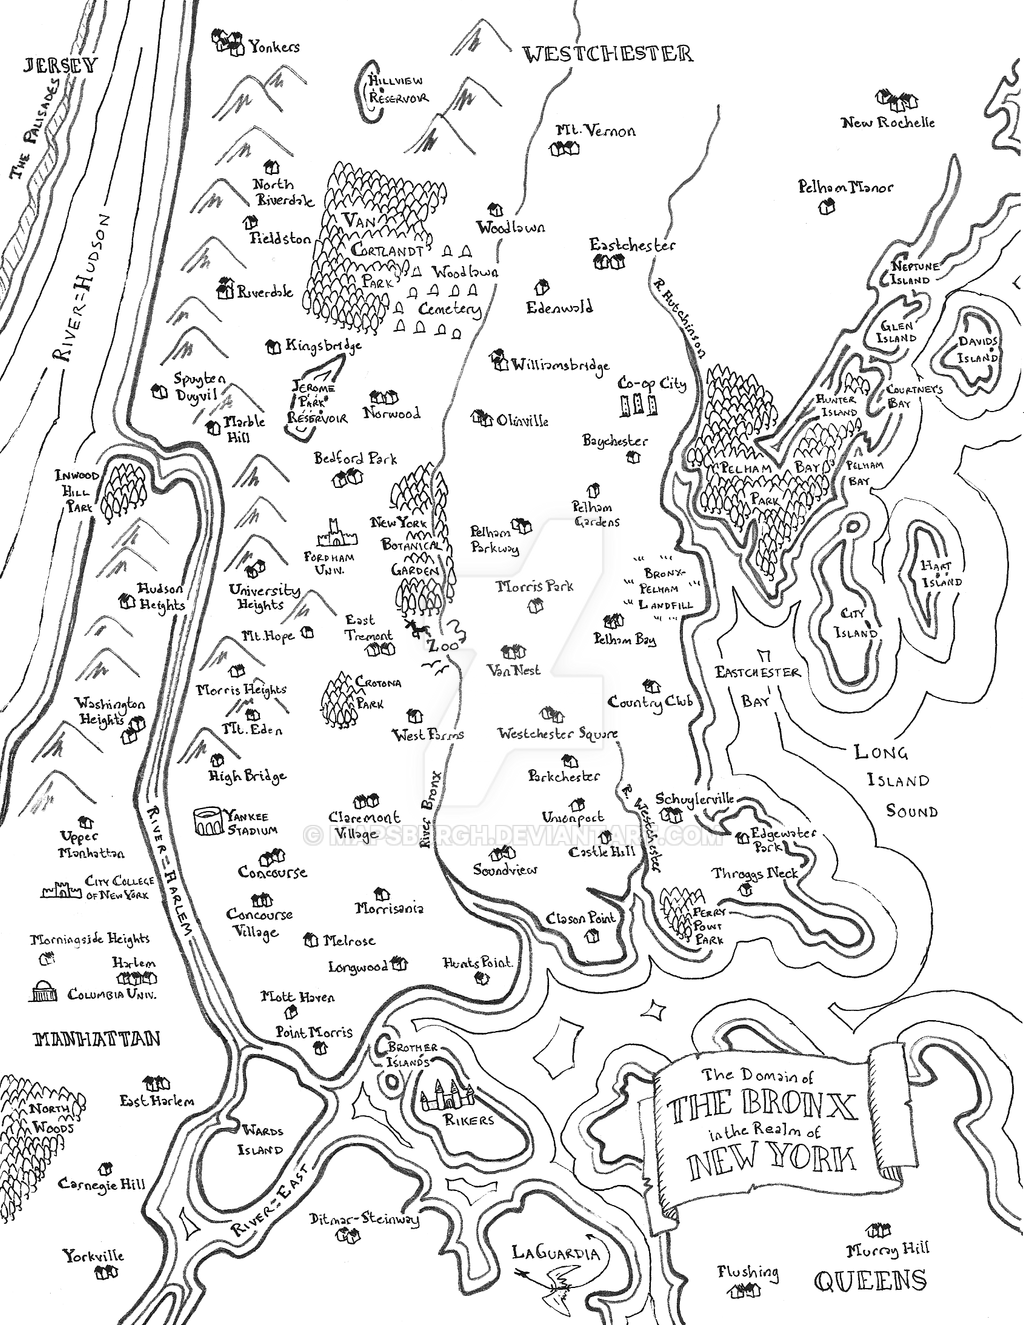 Bronx fantasy map by Mapsburgh